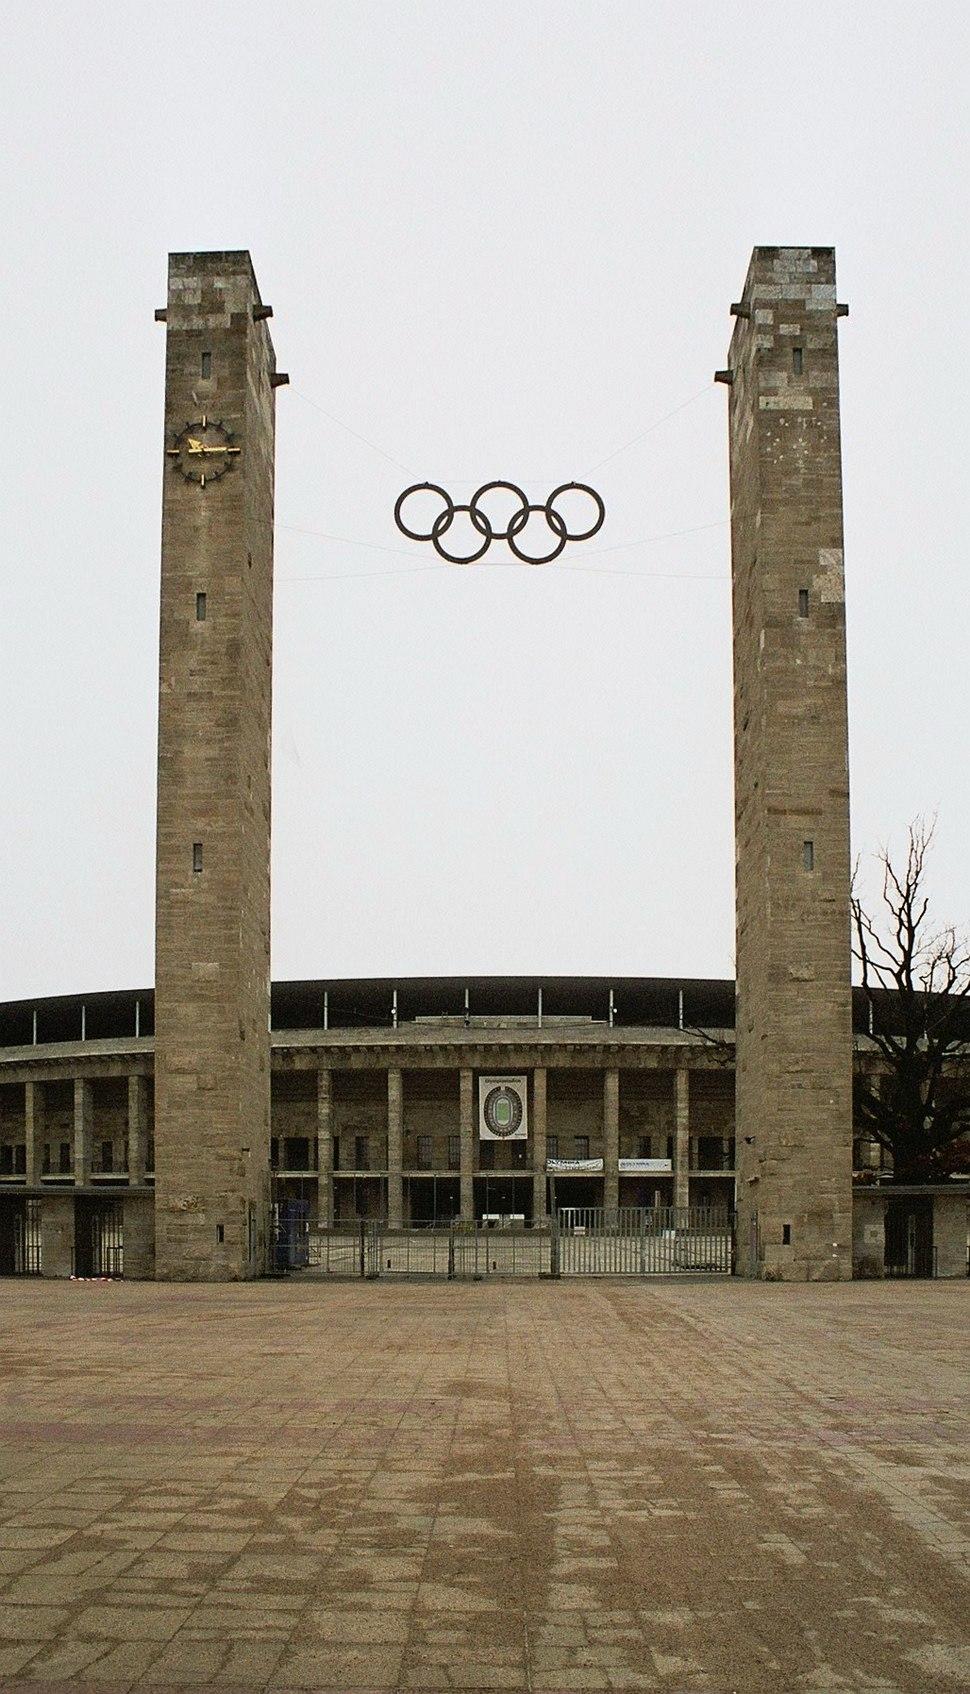 Berlin olympiastadion main entrance olympic rings dec 2004